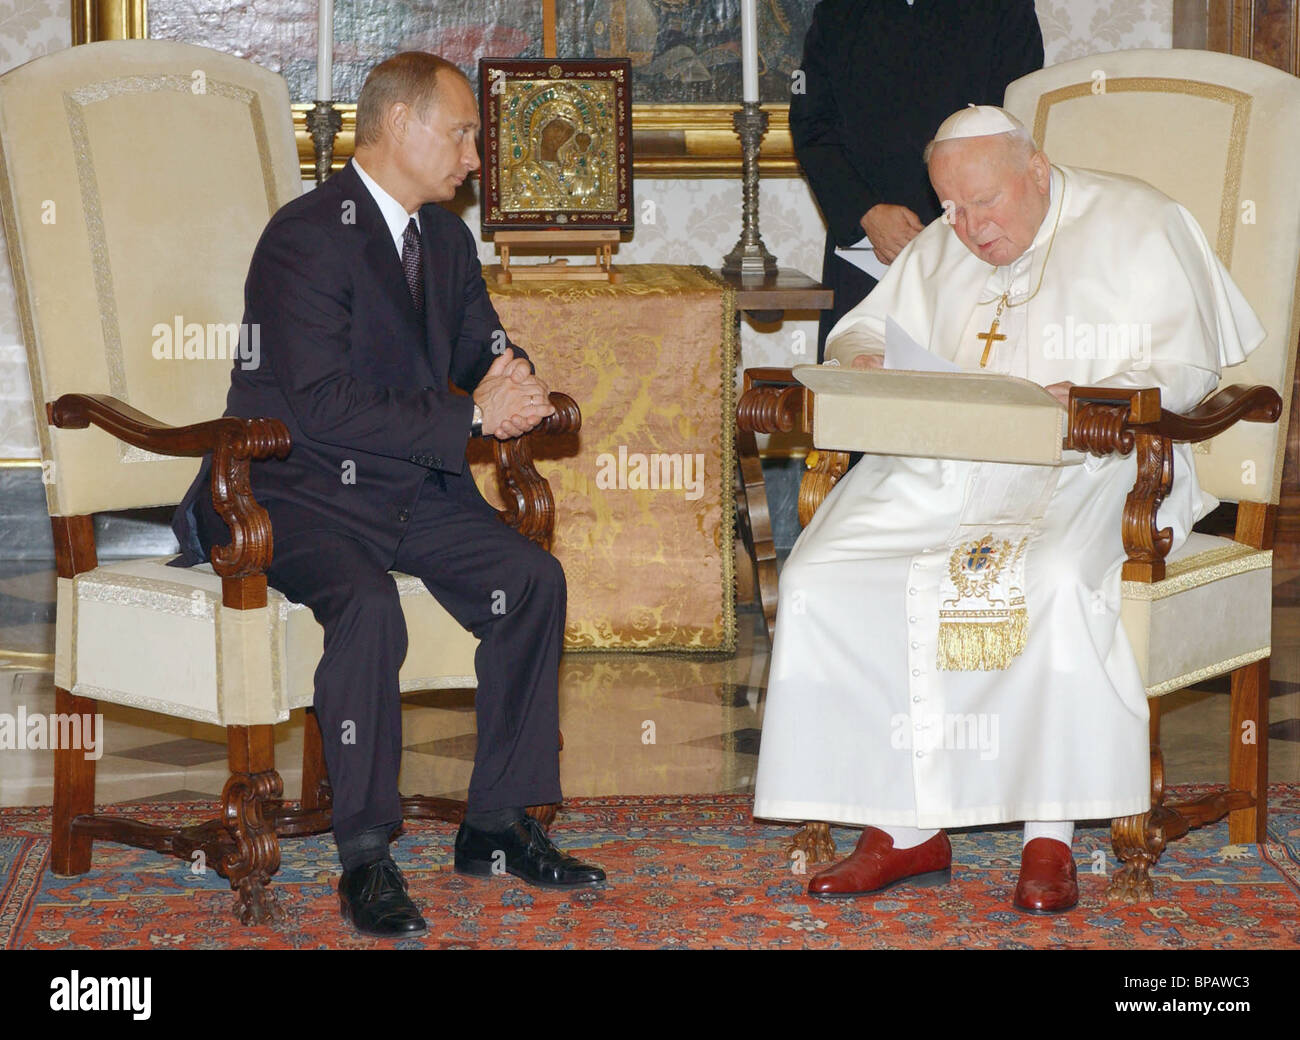 Meeting of President of Russia Vladimir Putin with Pope John Paul II - Stock Image